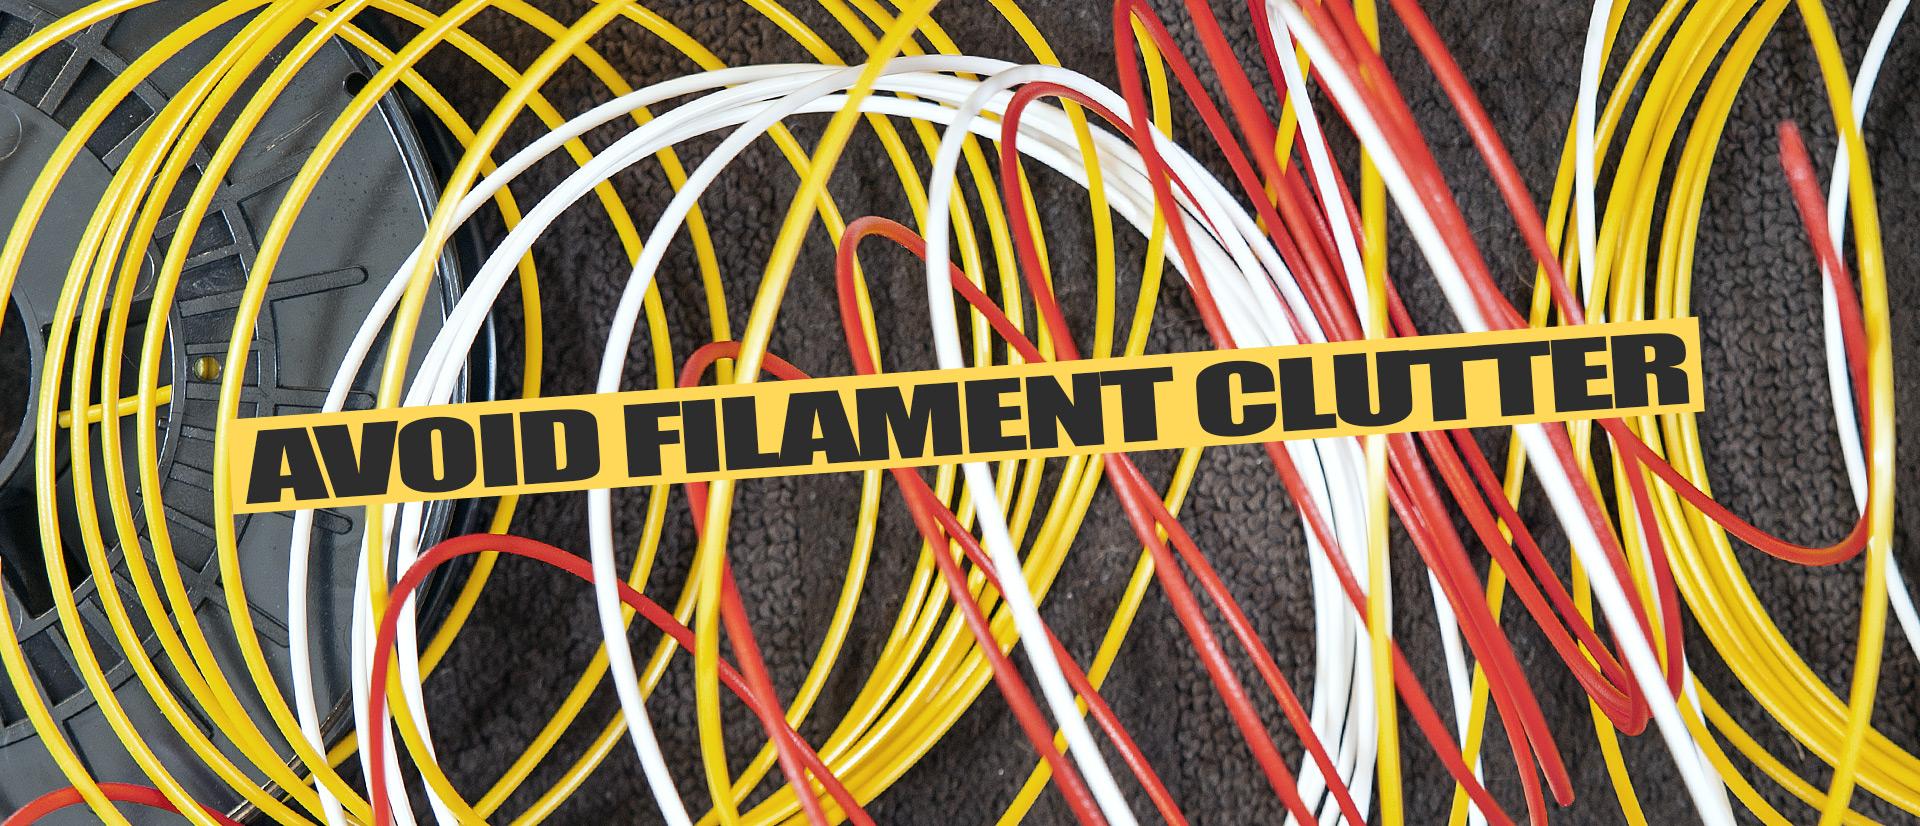 Justpressprint 3d printed Filament Clips Clutter